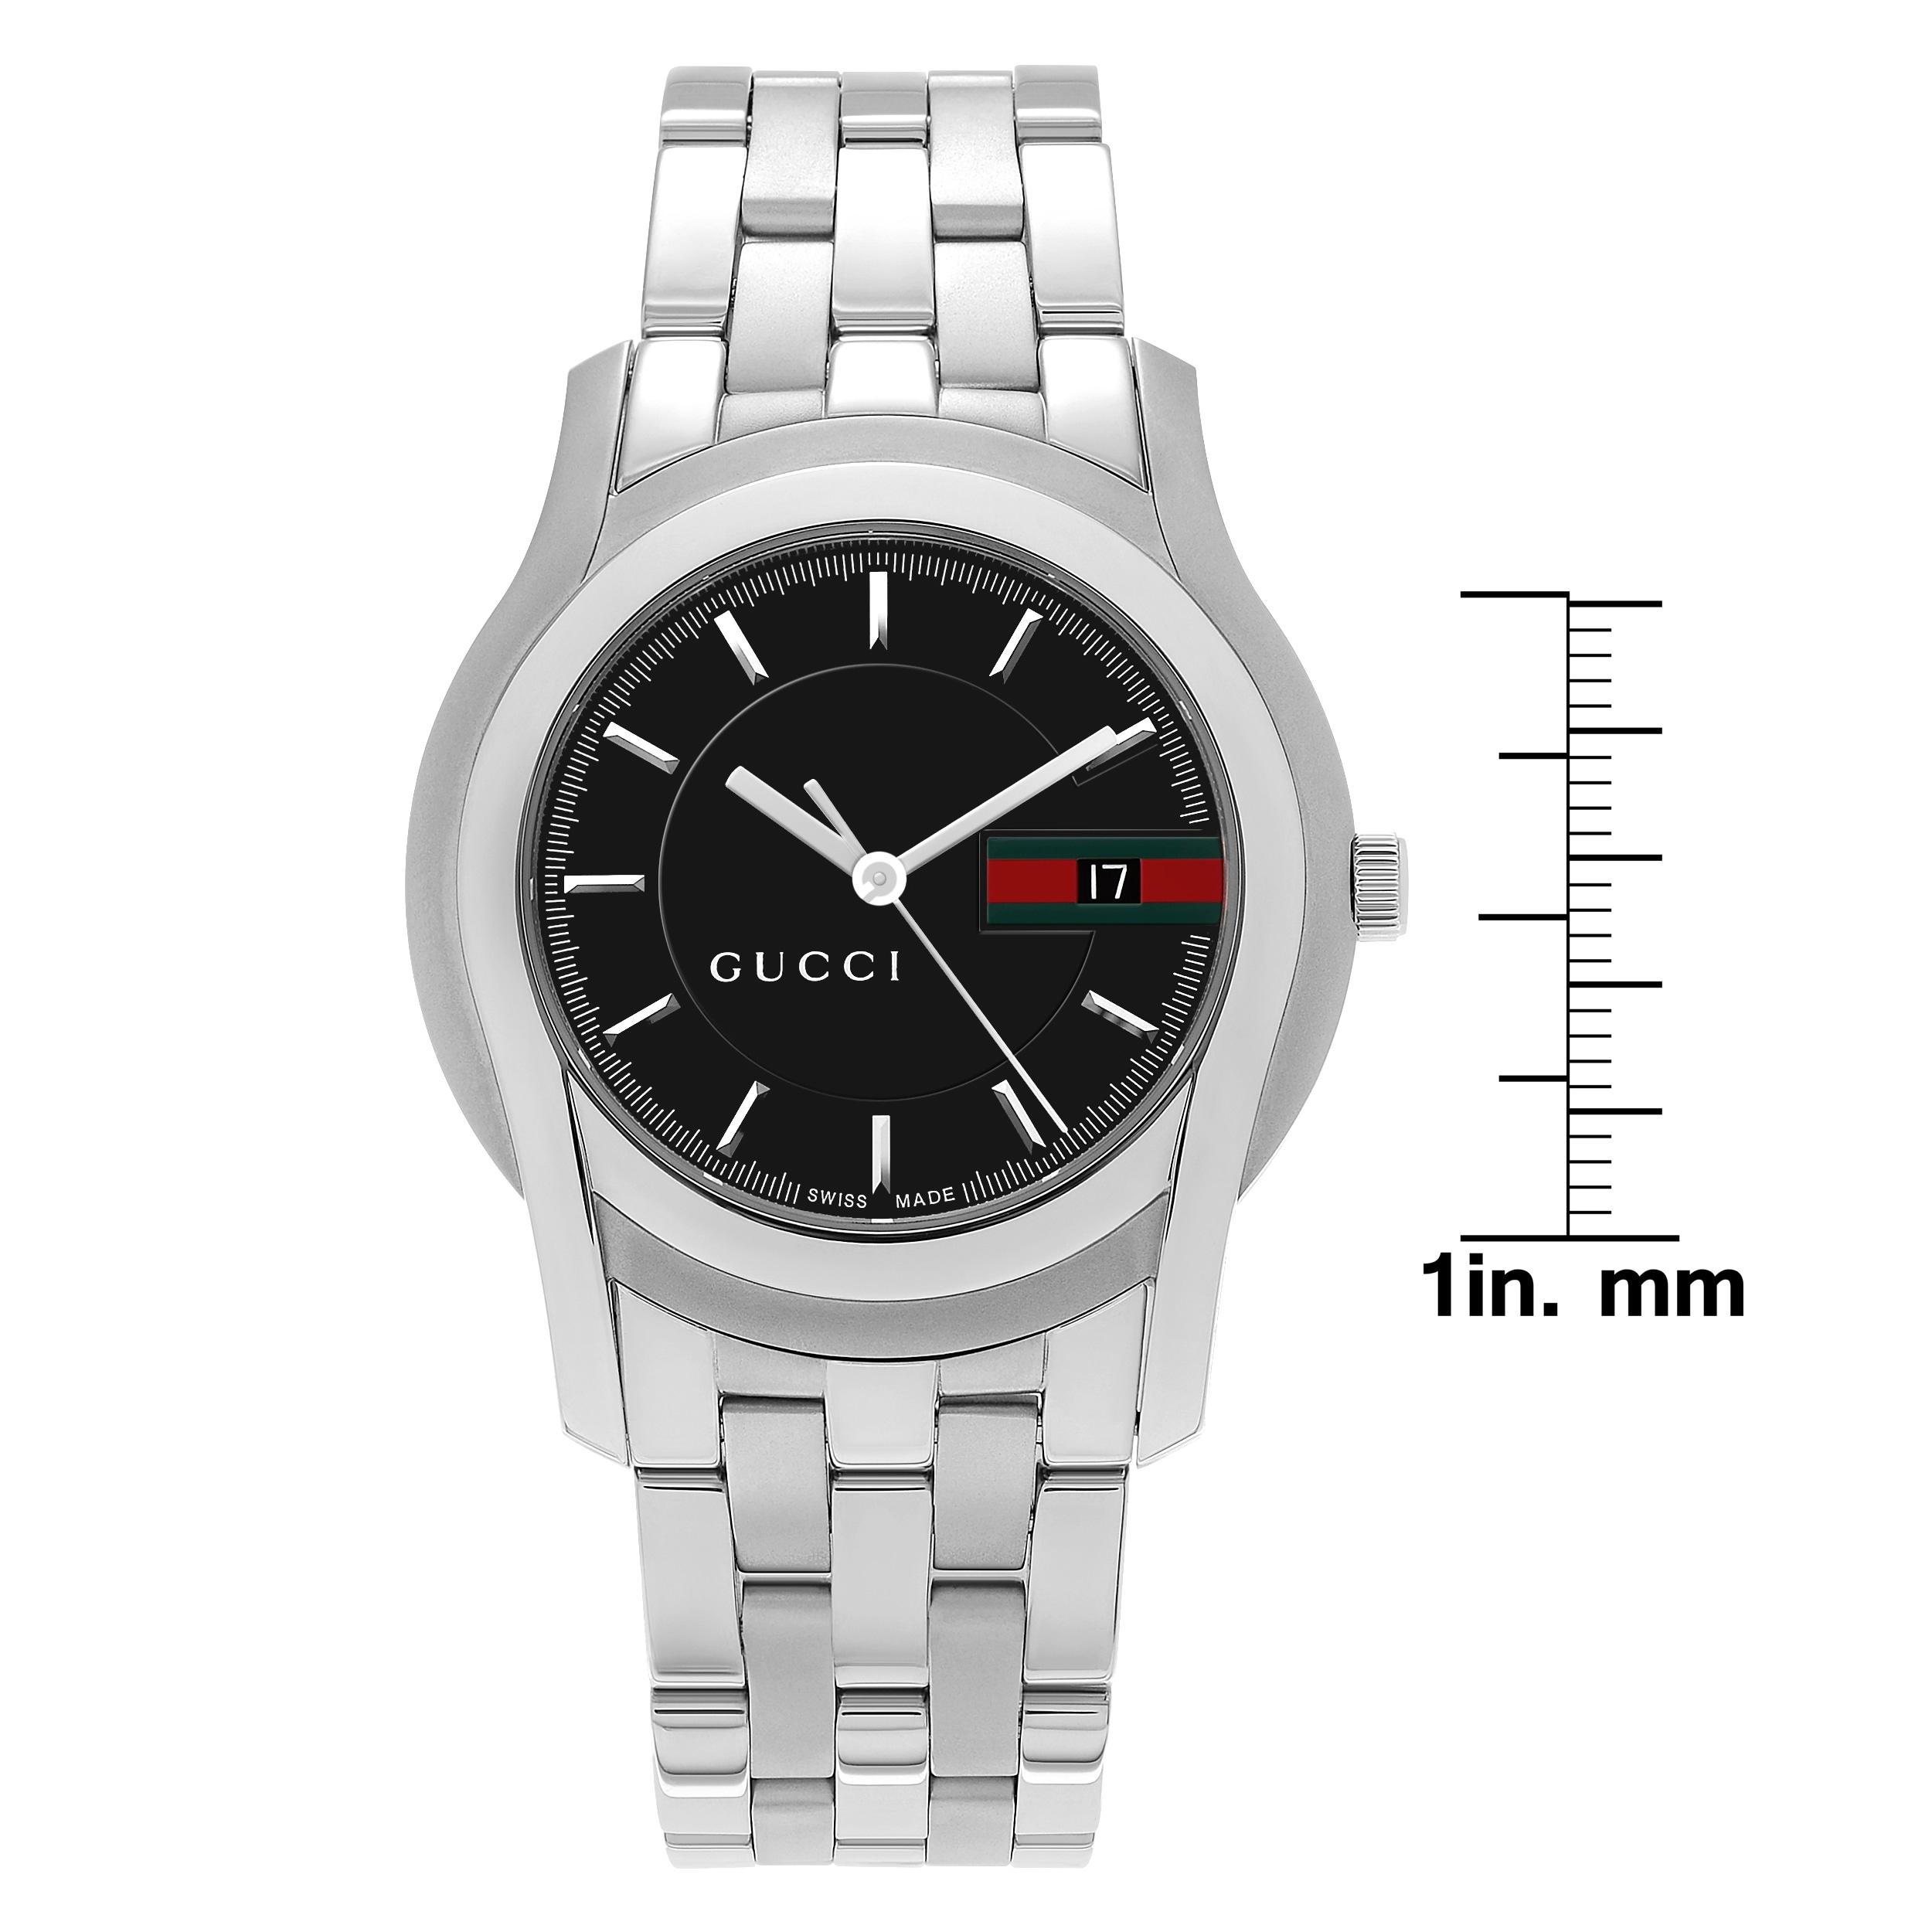 14c69e04c69 Gucci Men s YA055202  5500 XL  Black Dial Stainless Steel Bracelet Watch -  Silver